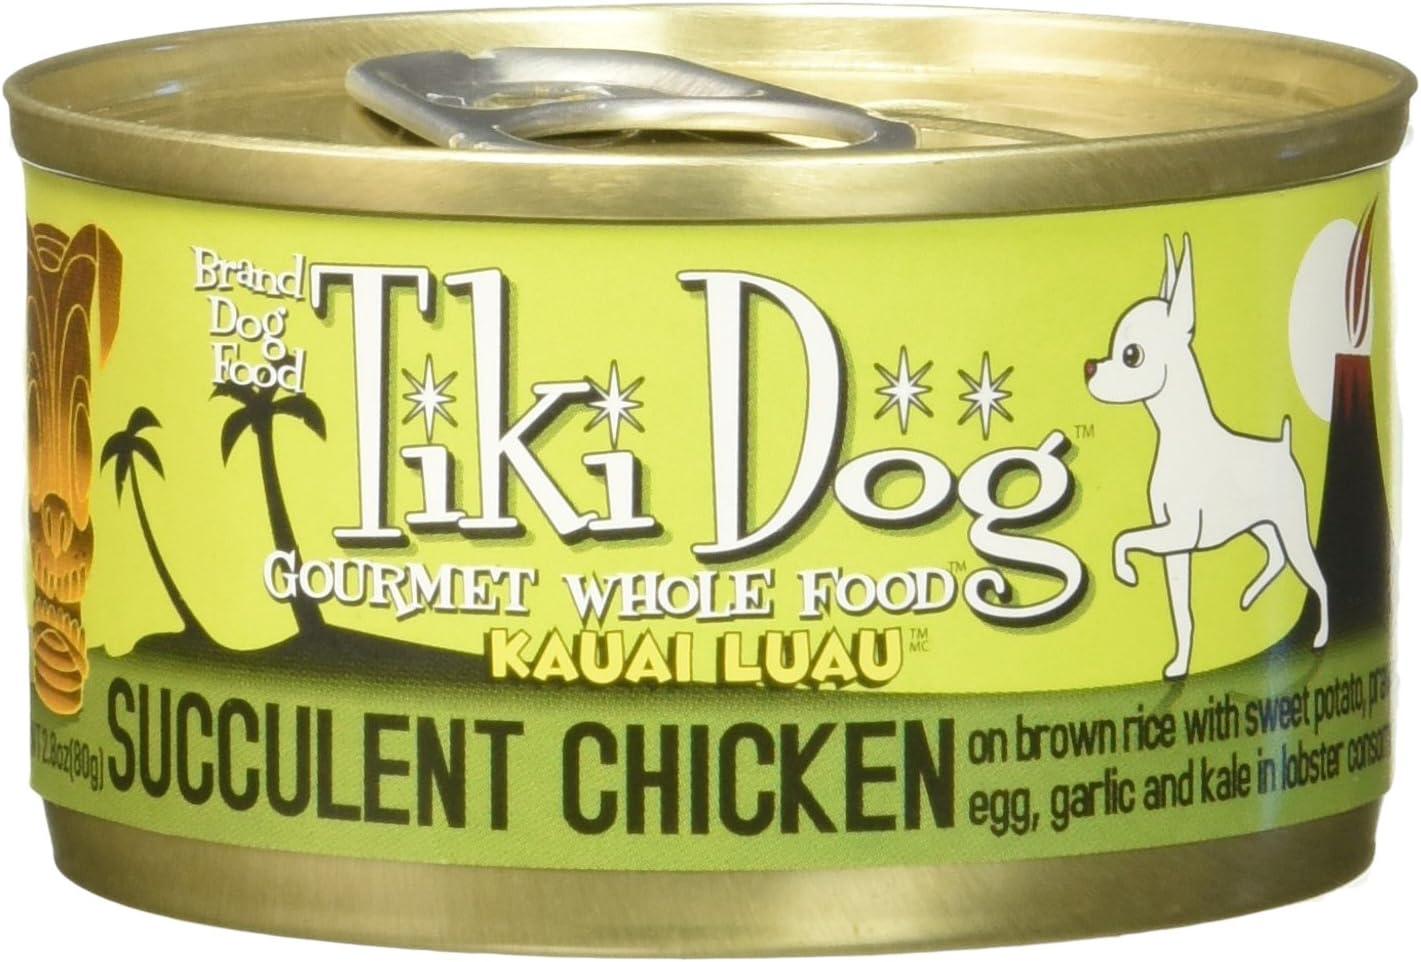 Tiki Dog Gourmet Whole Food 12-Pack Kauai Luau Succulent Chicken on Brown Rice with Sweet Potato, Tiger Prawns, Egg, Kale, Garlic in Lobster Consommé Pet Food